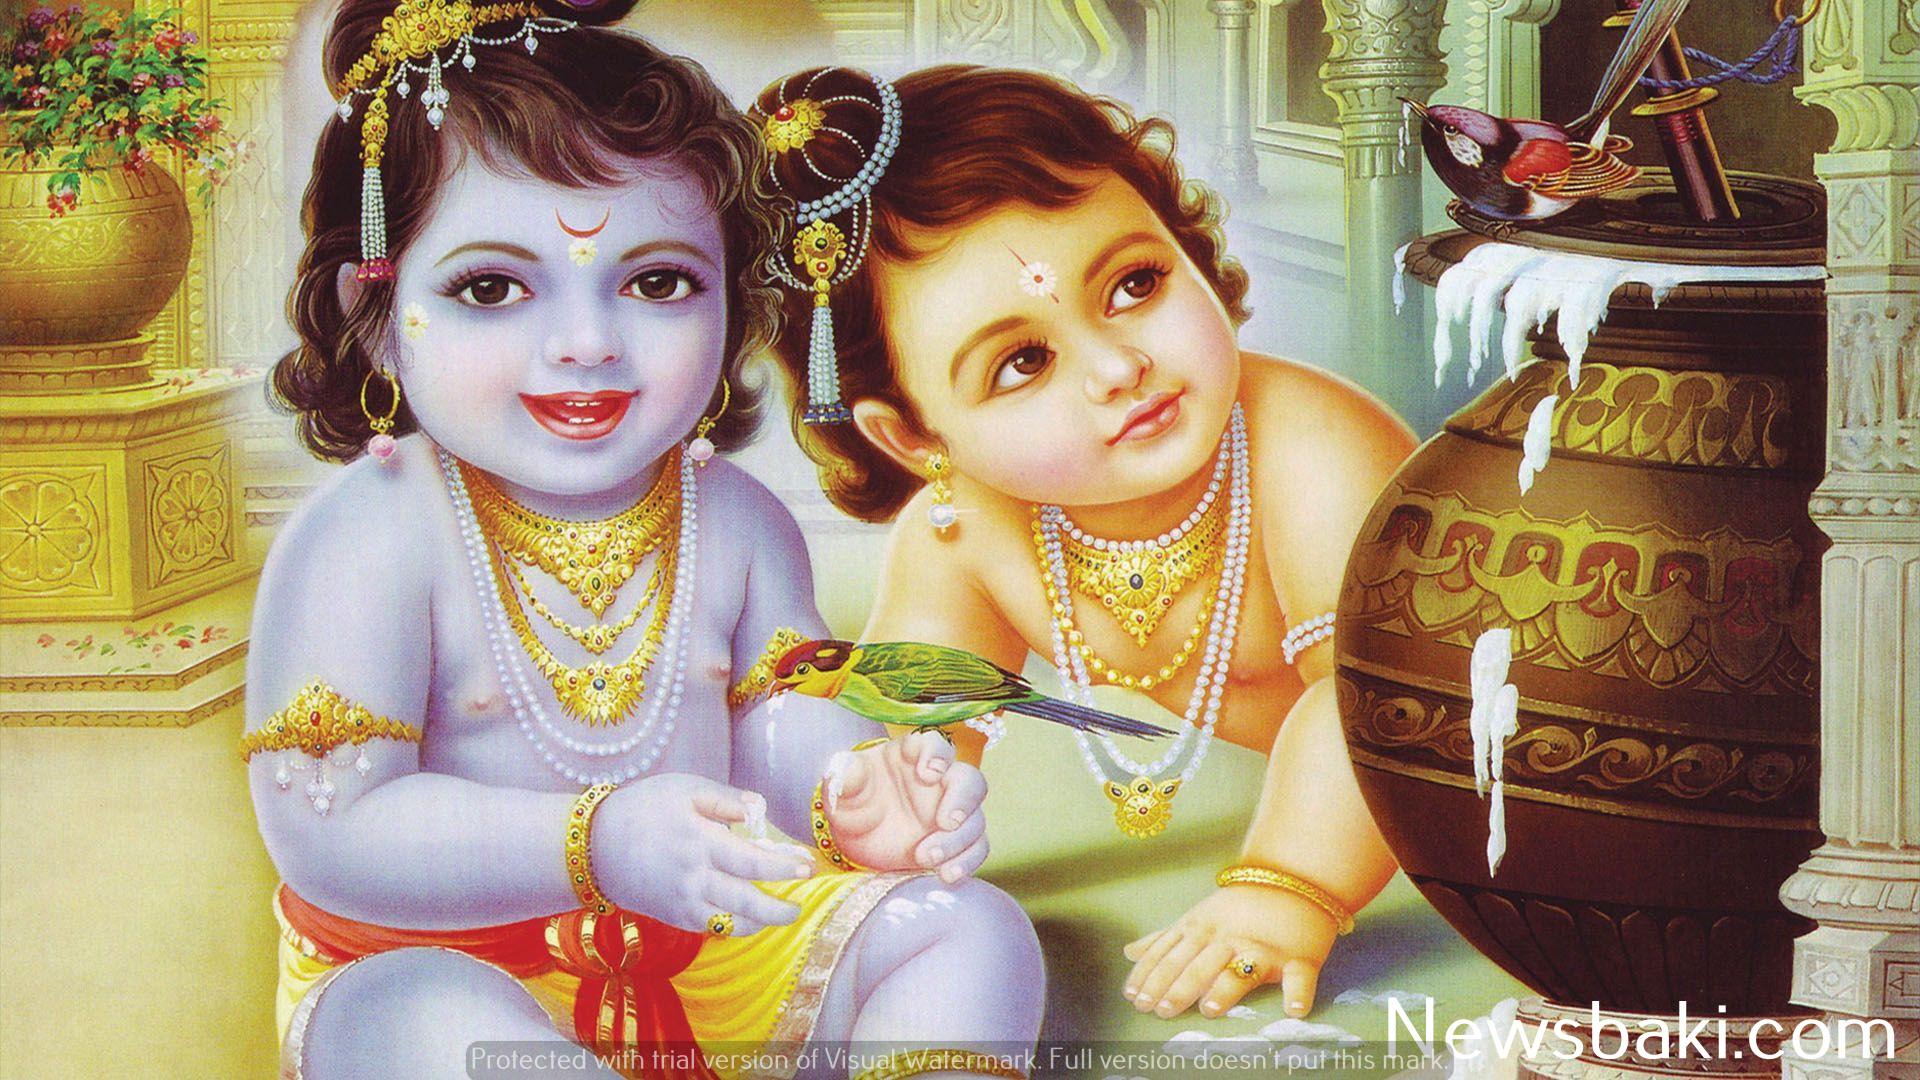 cute baby krishna images download 2